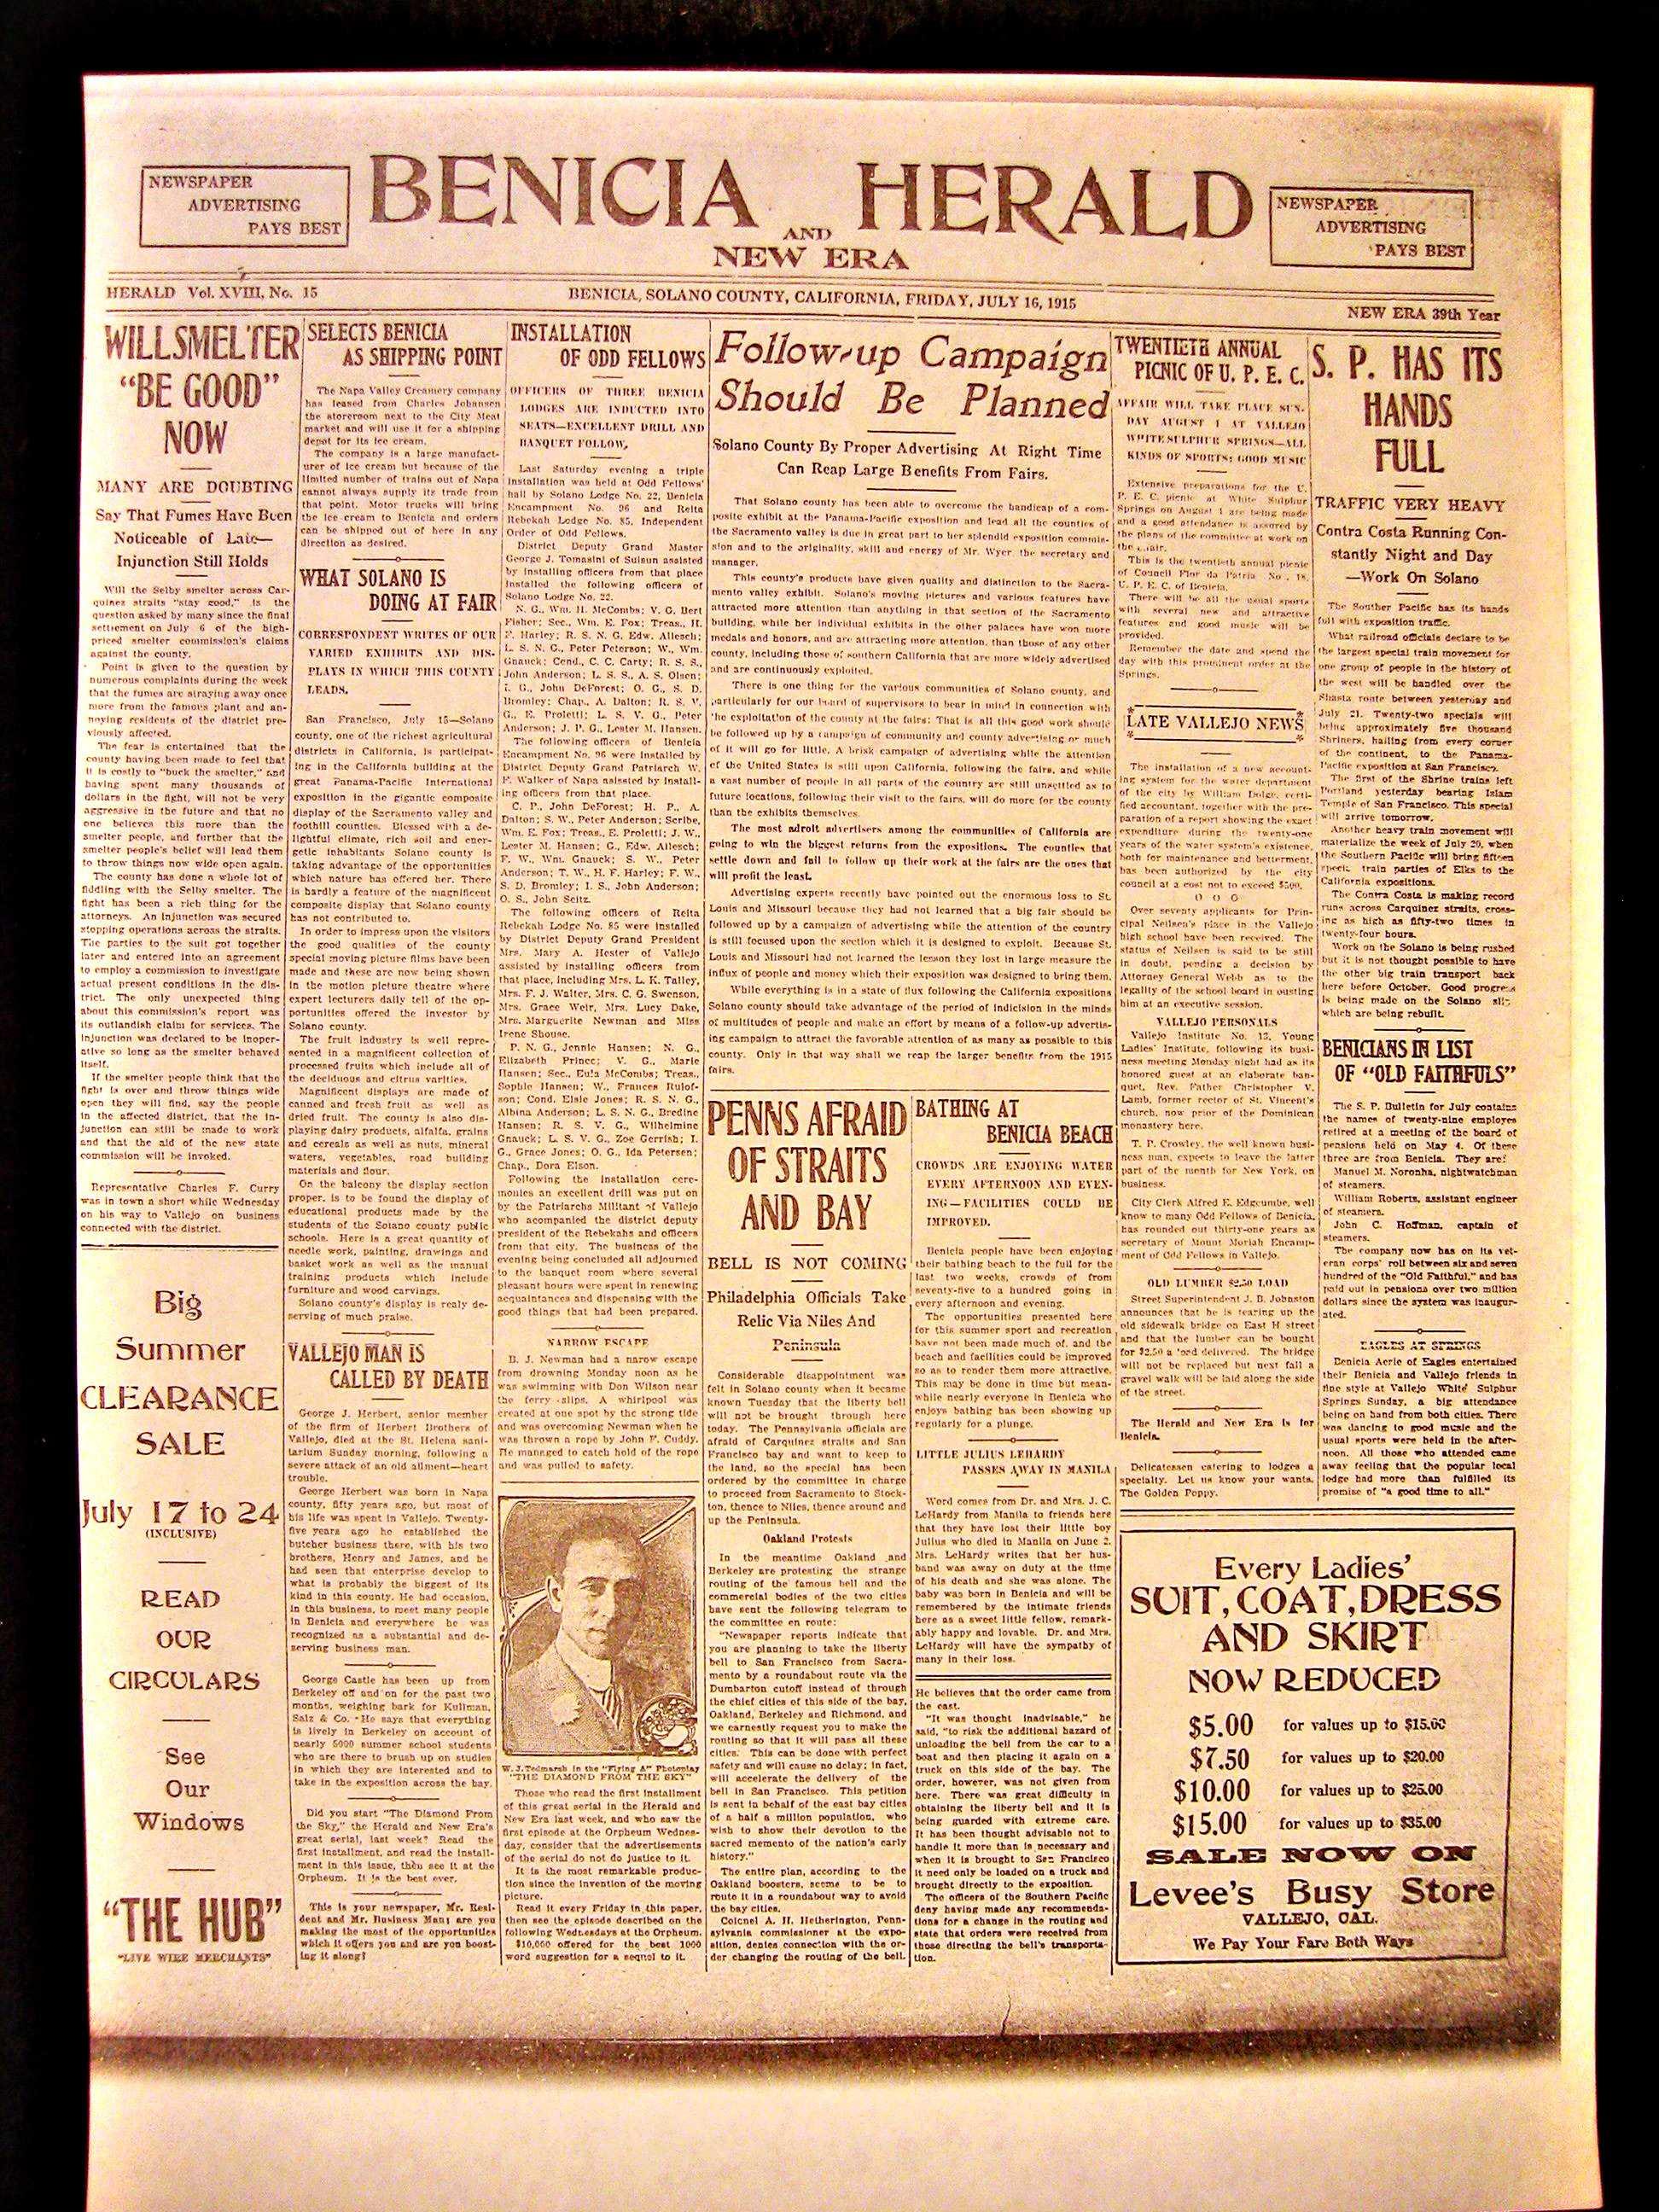 Benicia Herald, July 16, 1915